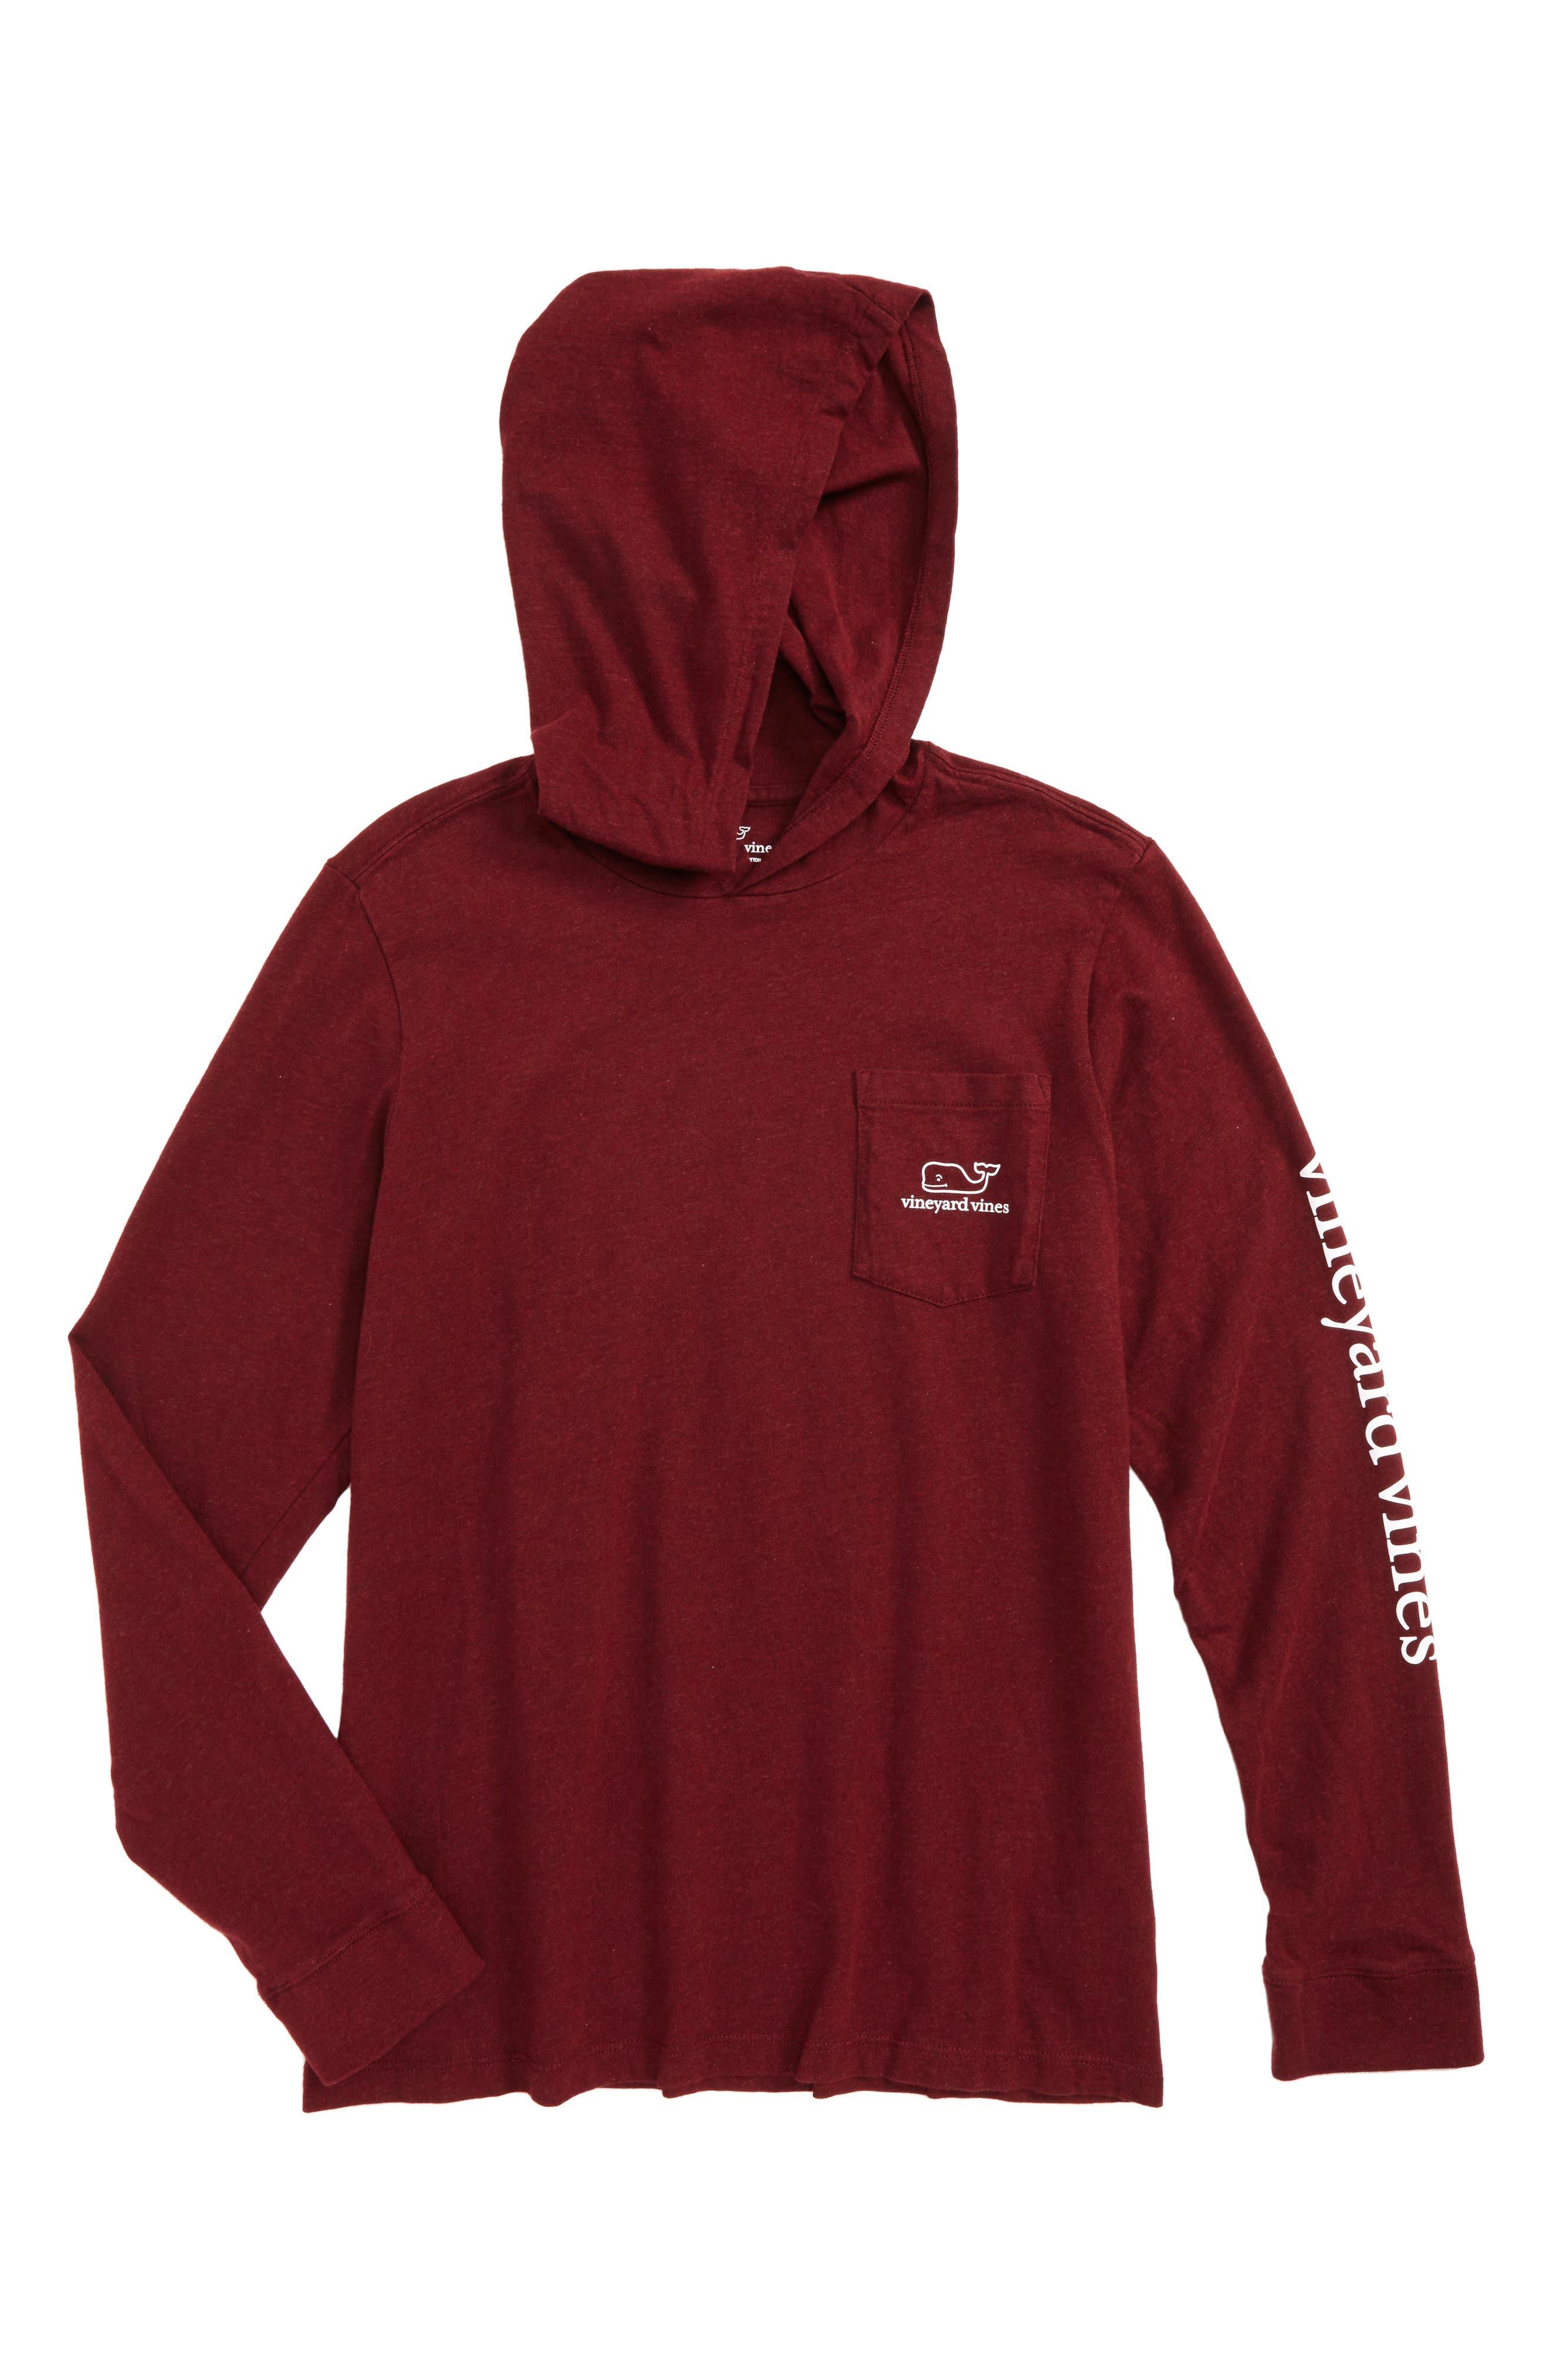 vineyard vines Whale Hooded T-Shirt (Big Boys)